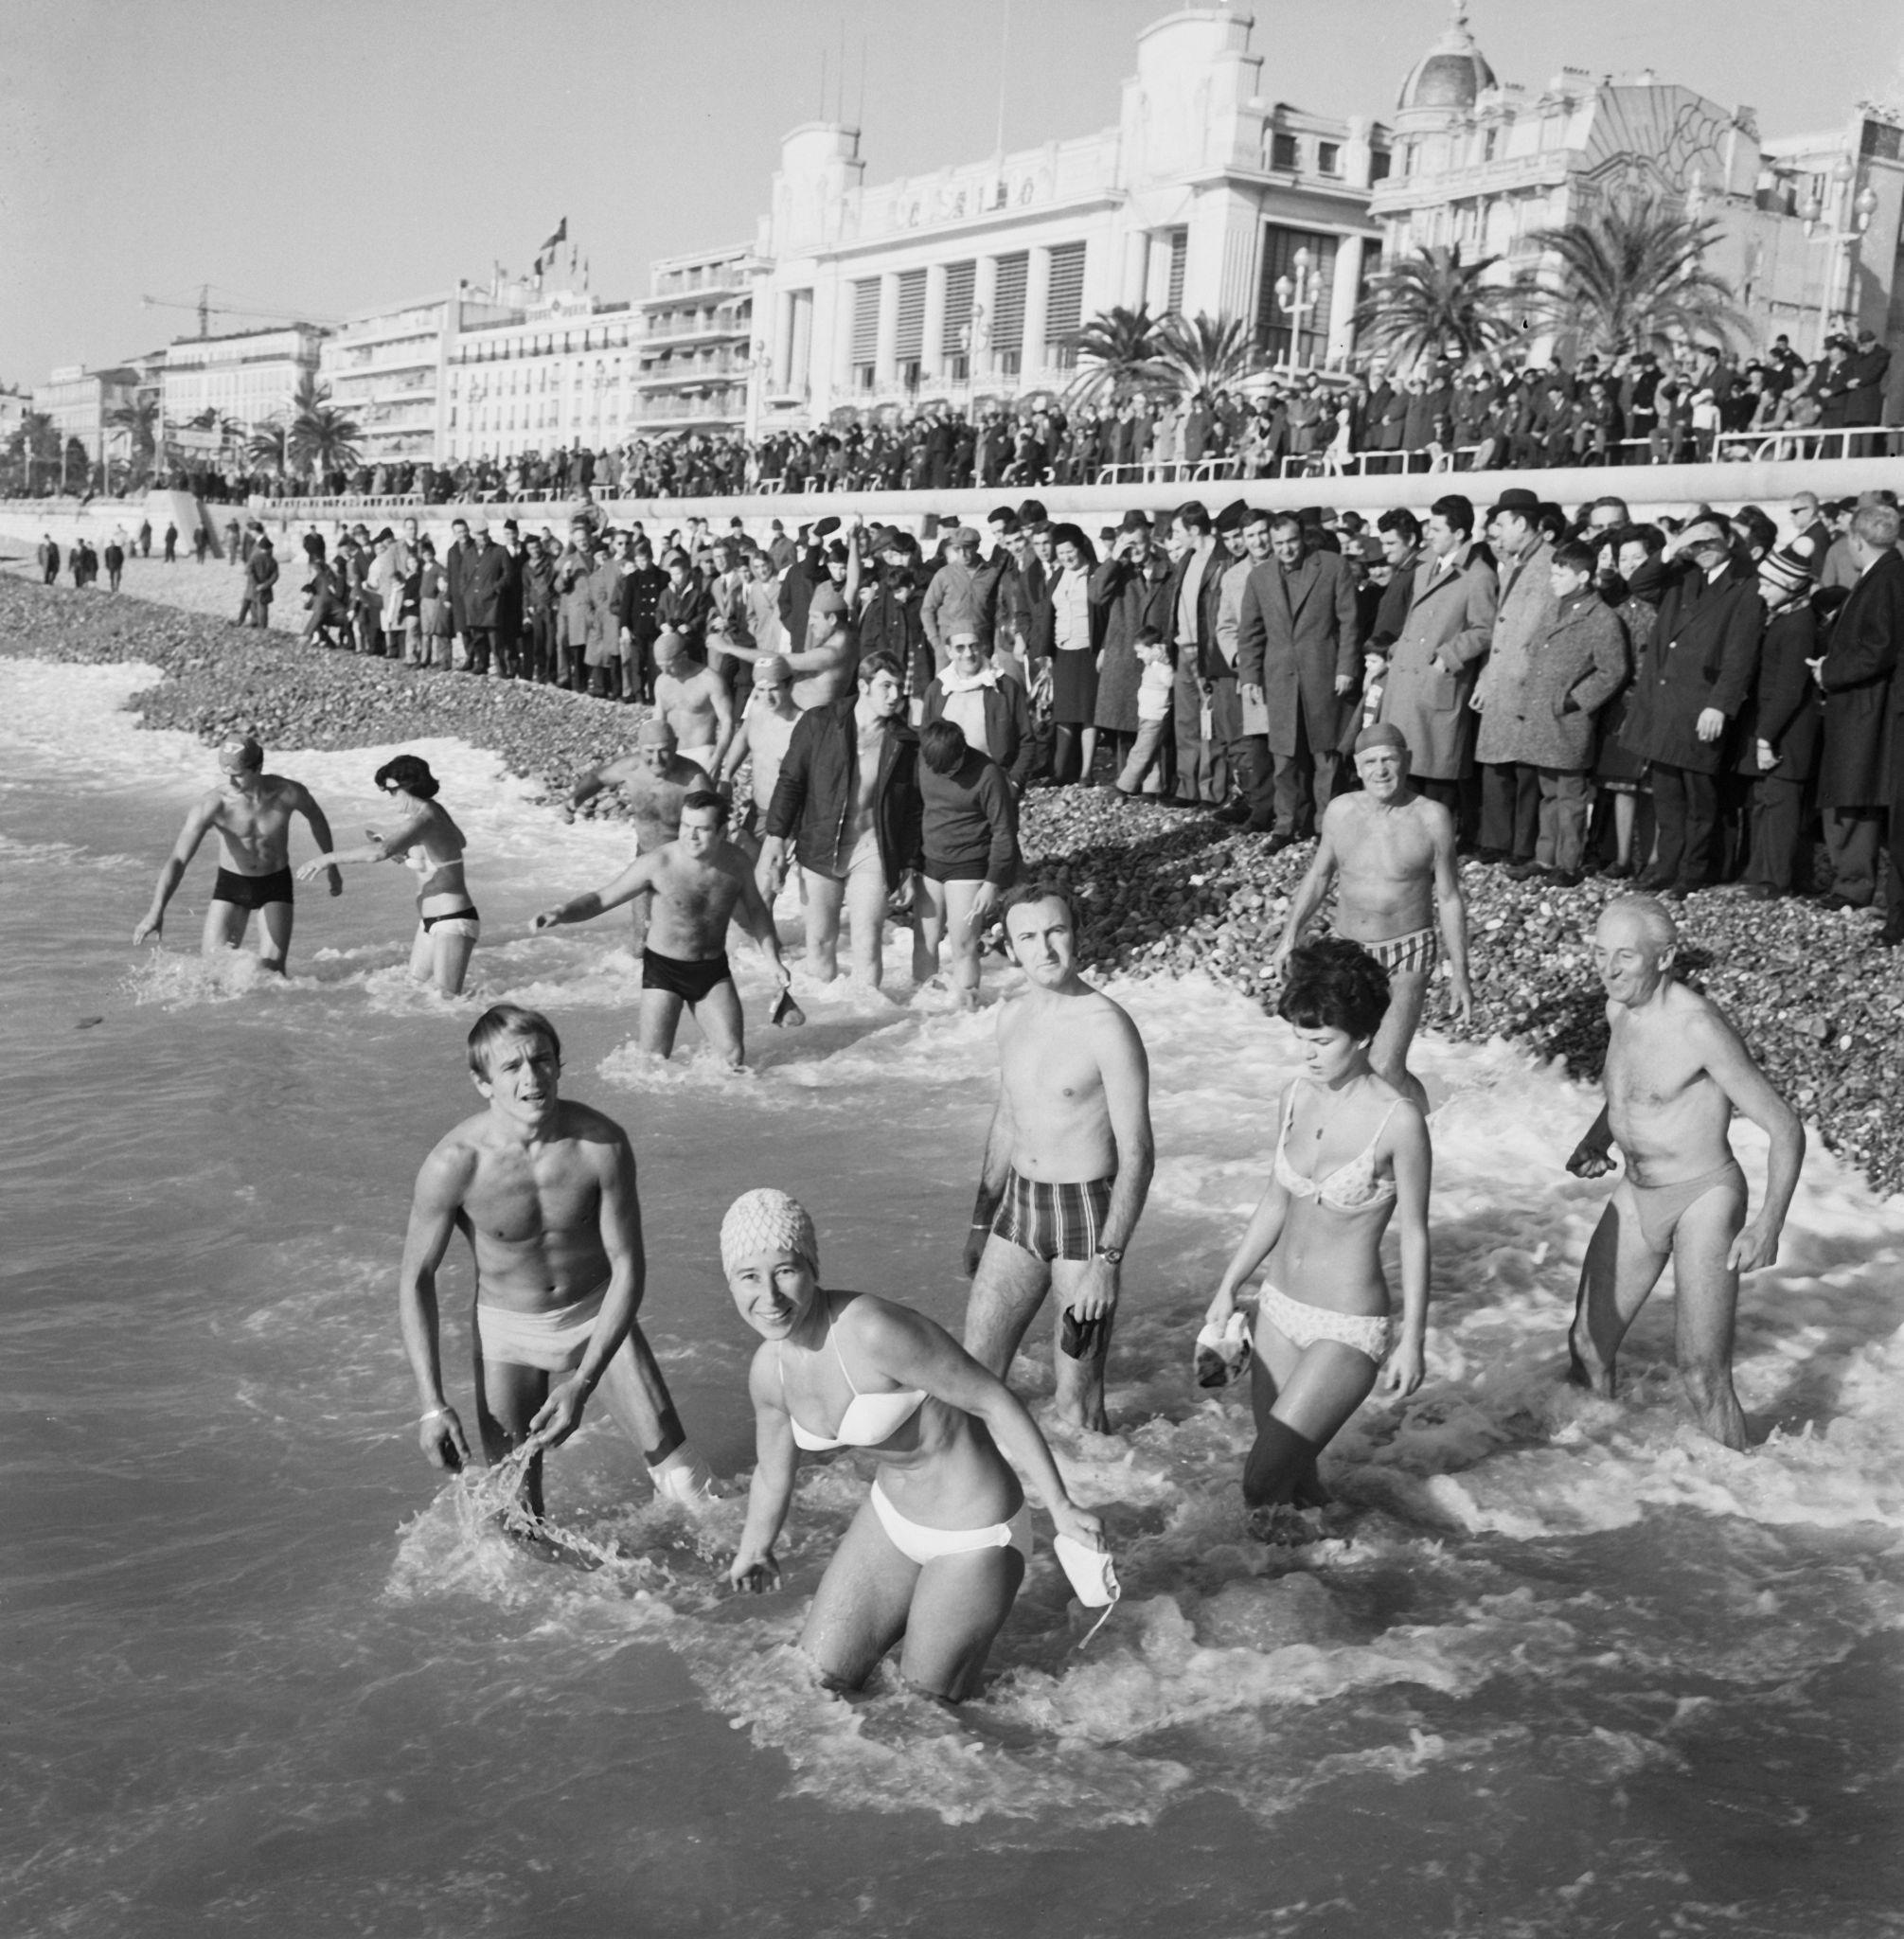 1968. Купание в канун Нового года под ярким солнцем на пляж в Ницце, 1 января.jpg